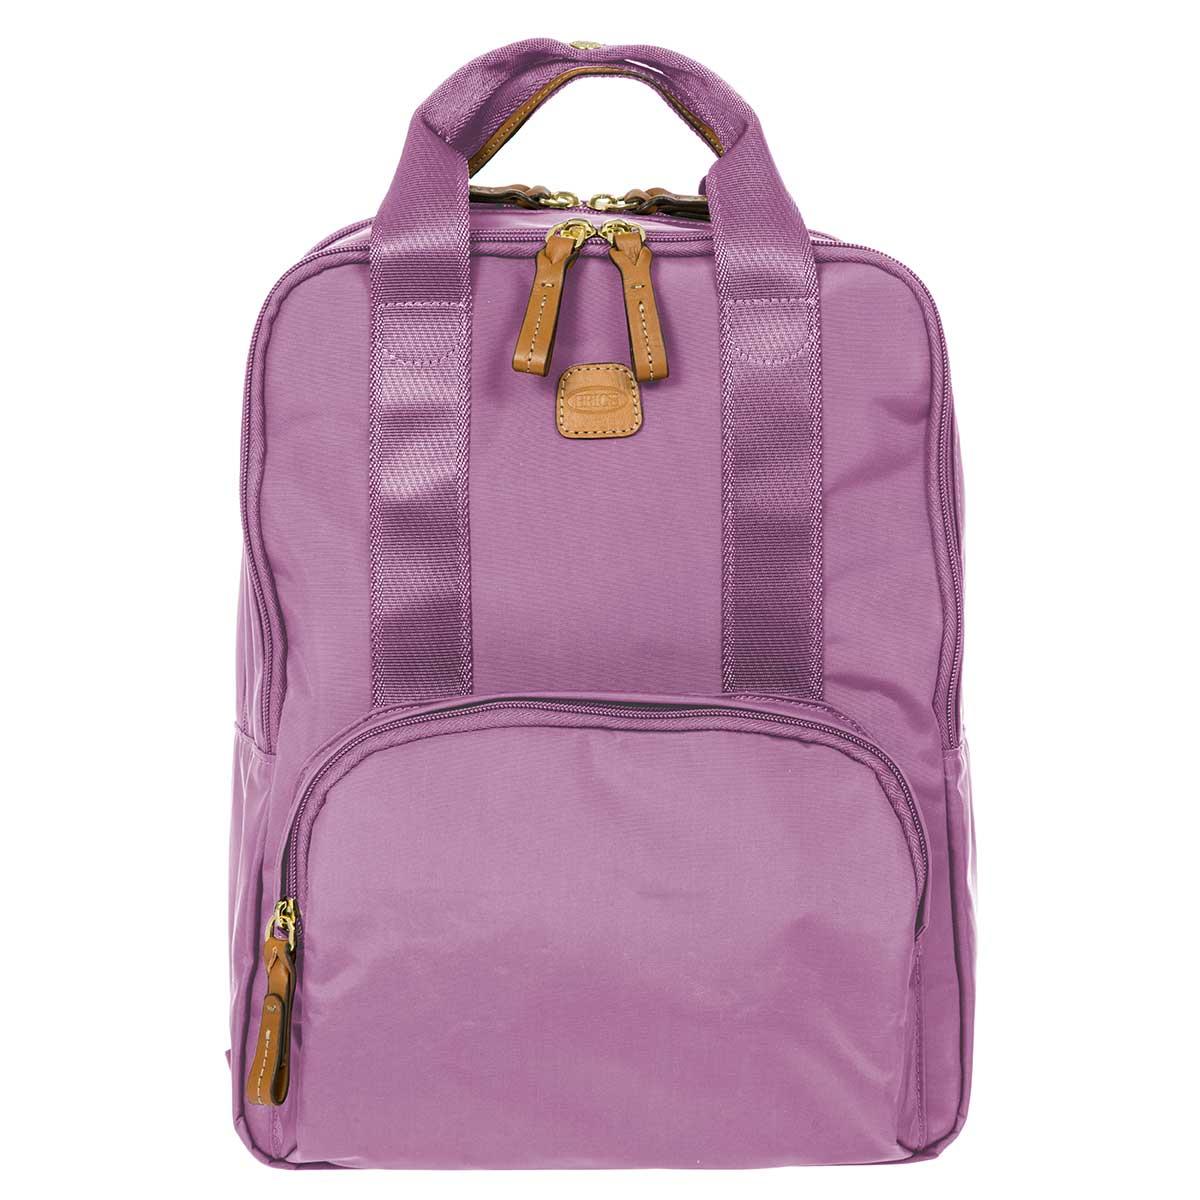 X-bag Urban Backpack - Wisteria   BRIC'S Travel Bags